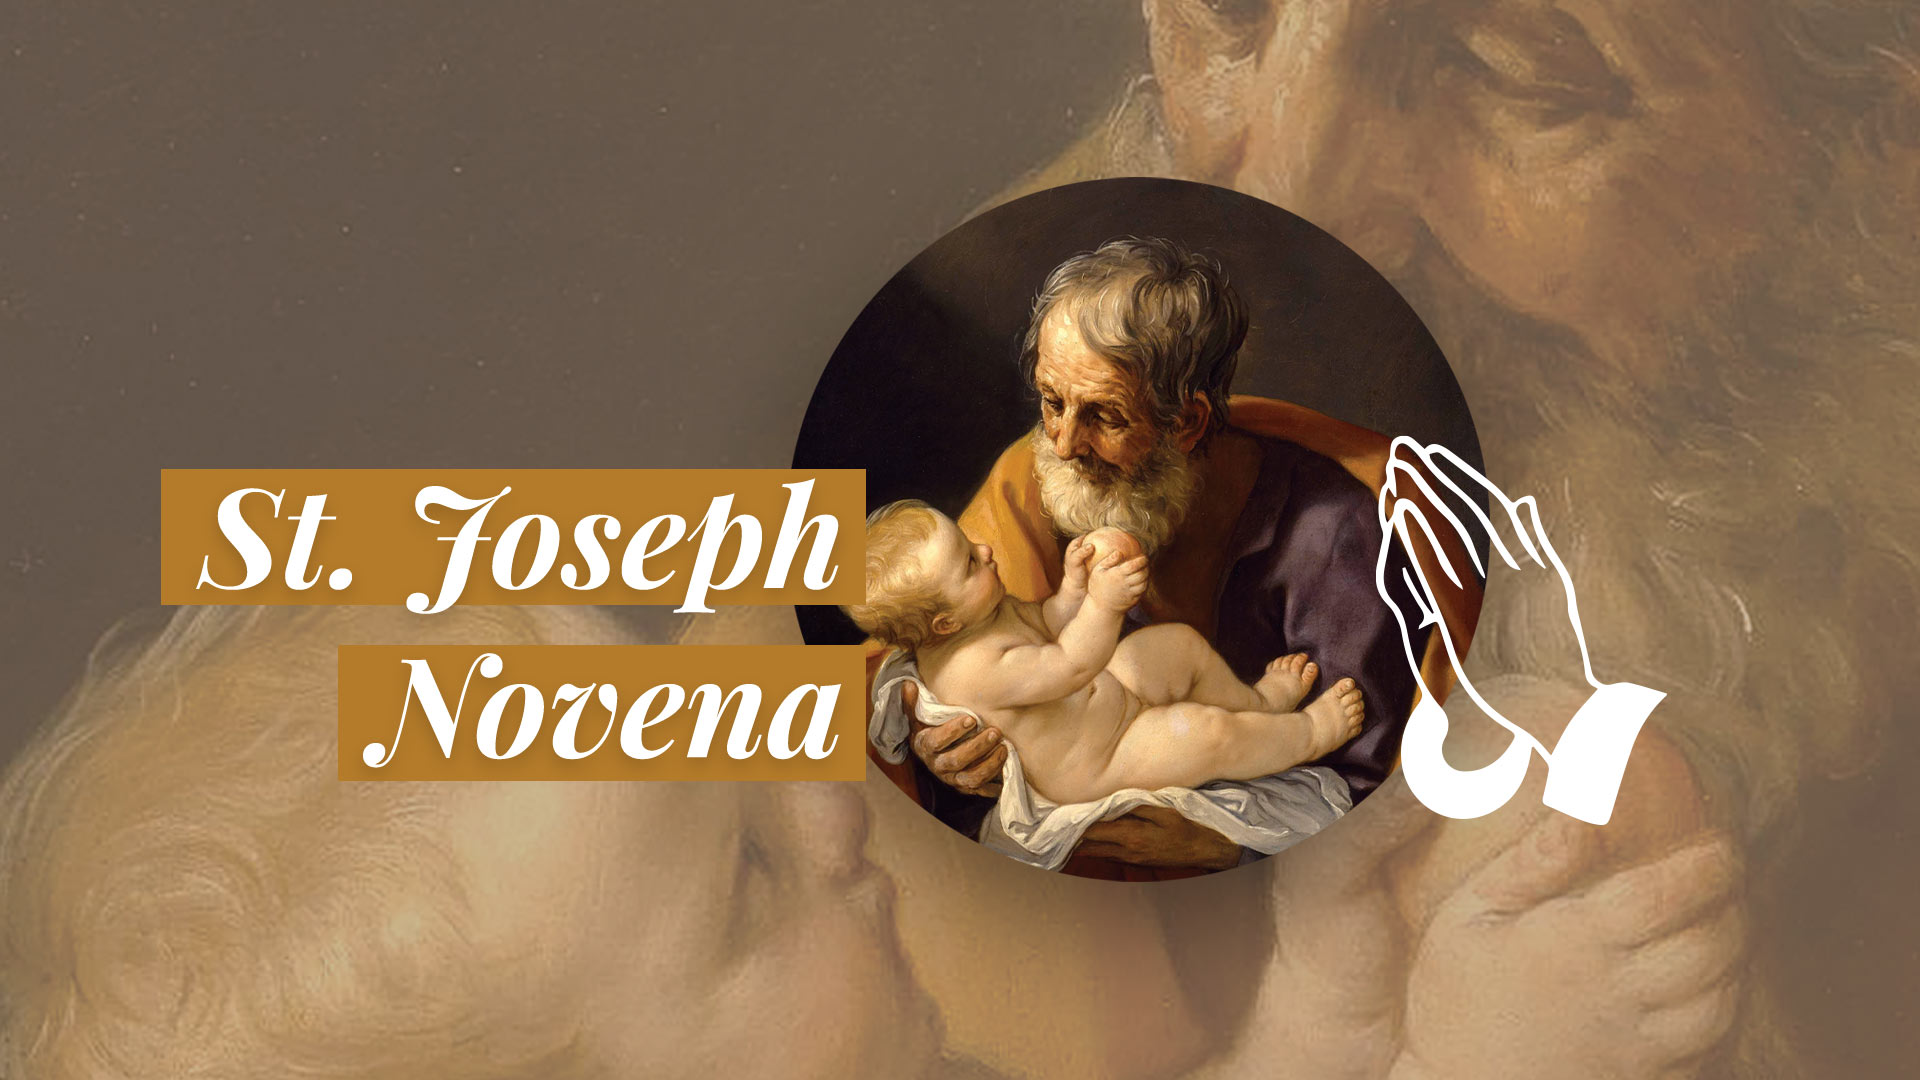 9 reasons why we should pray the St. Joseph Novena